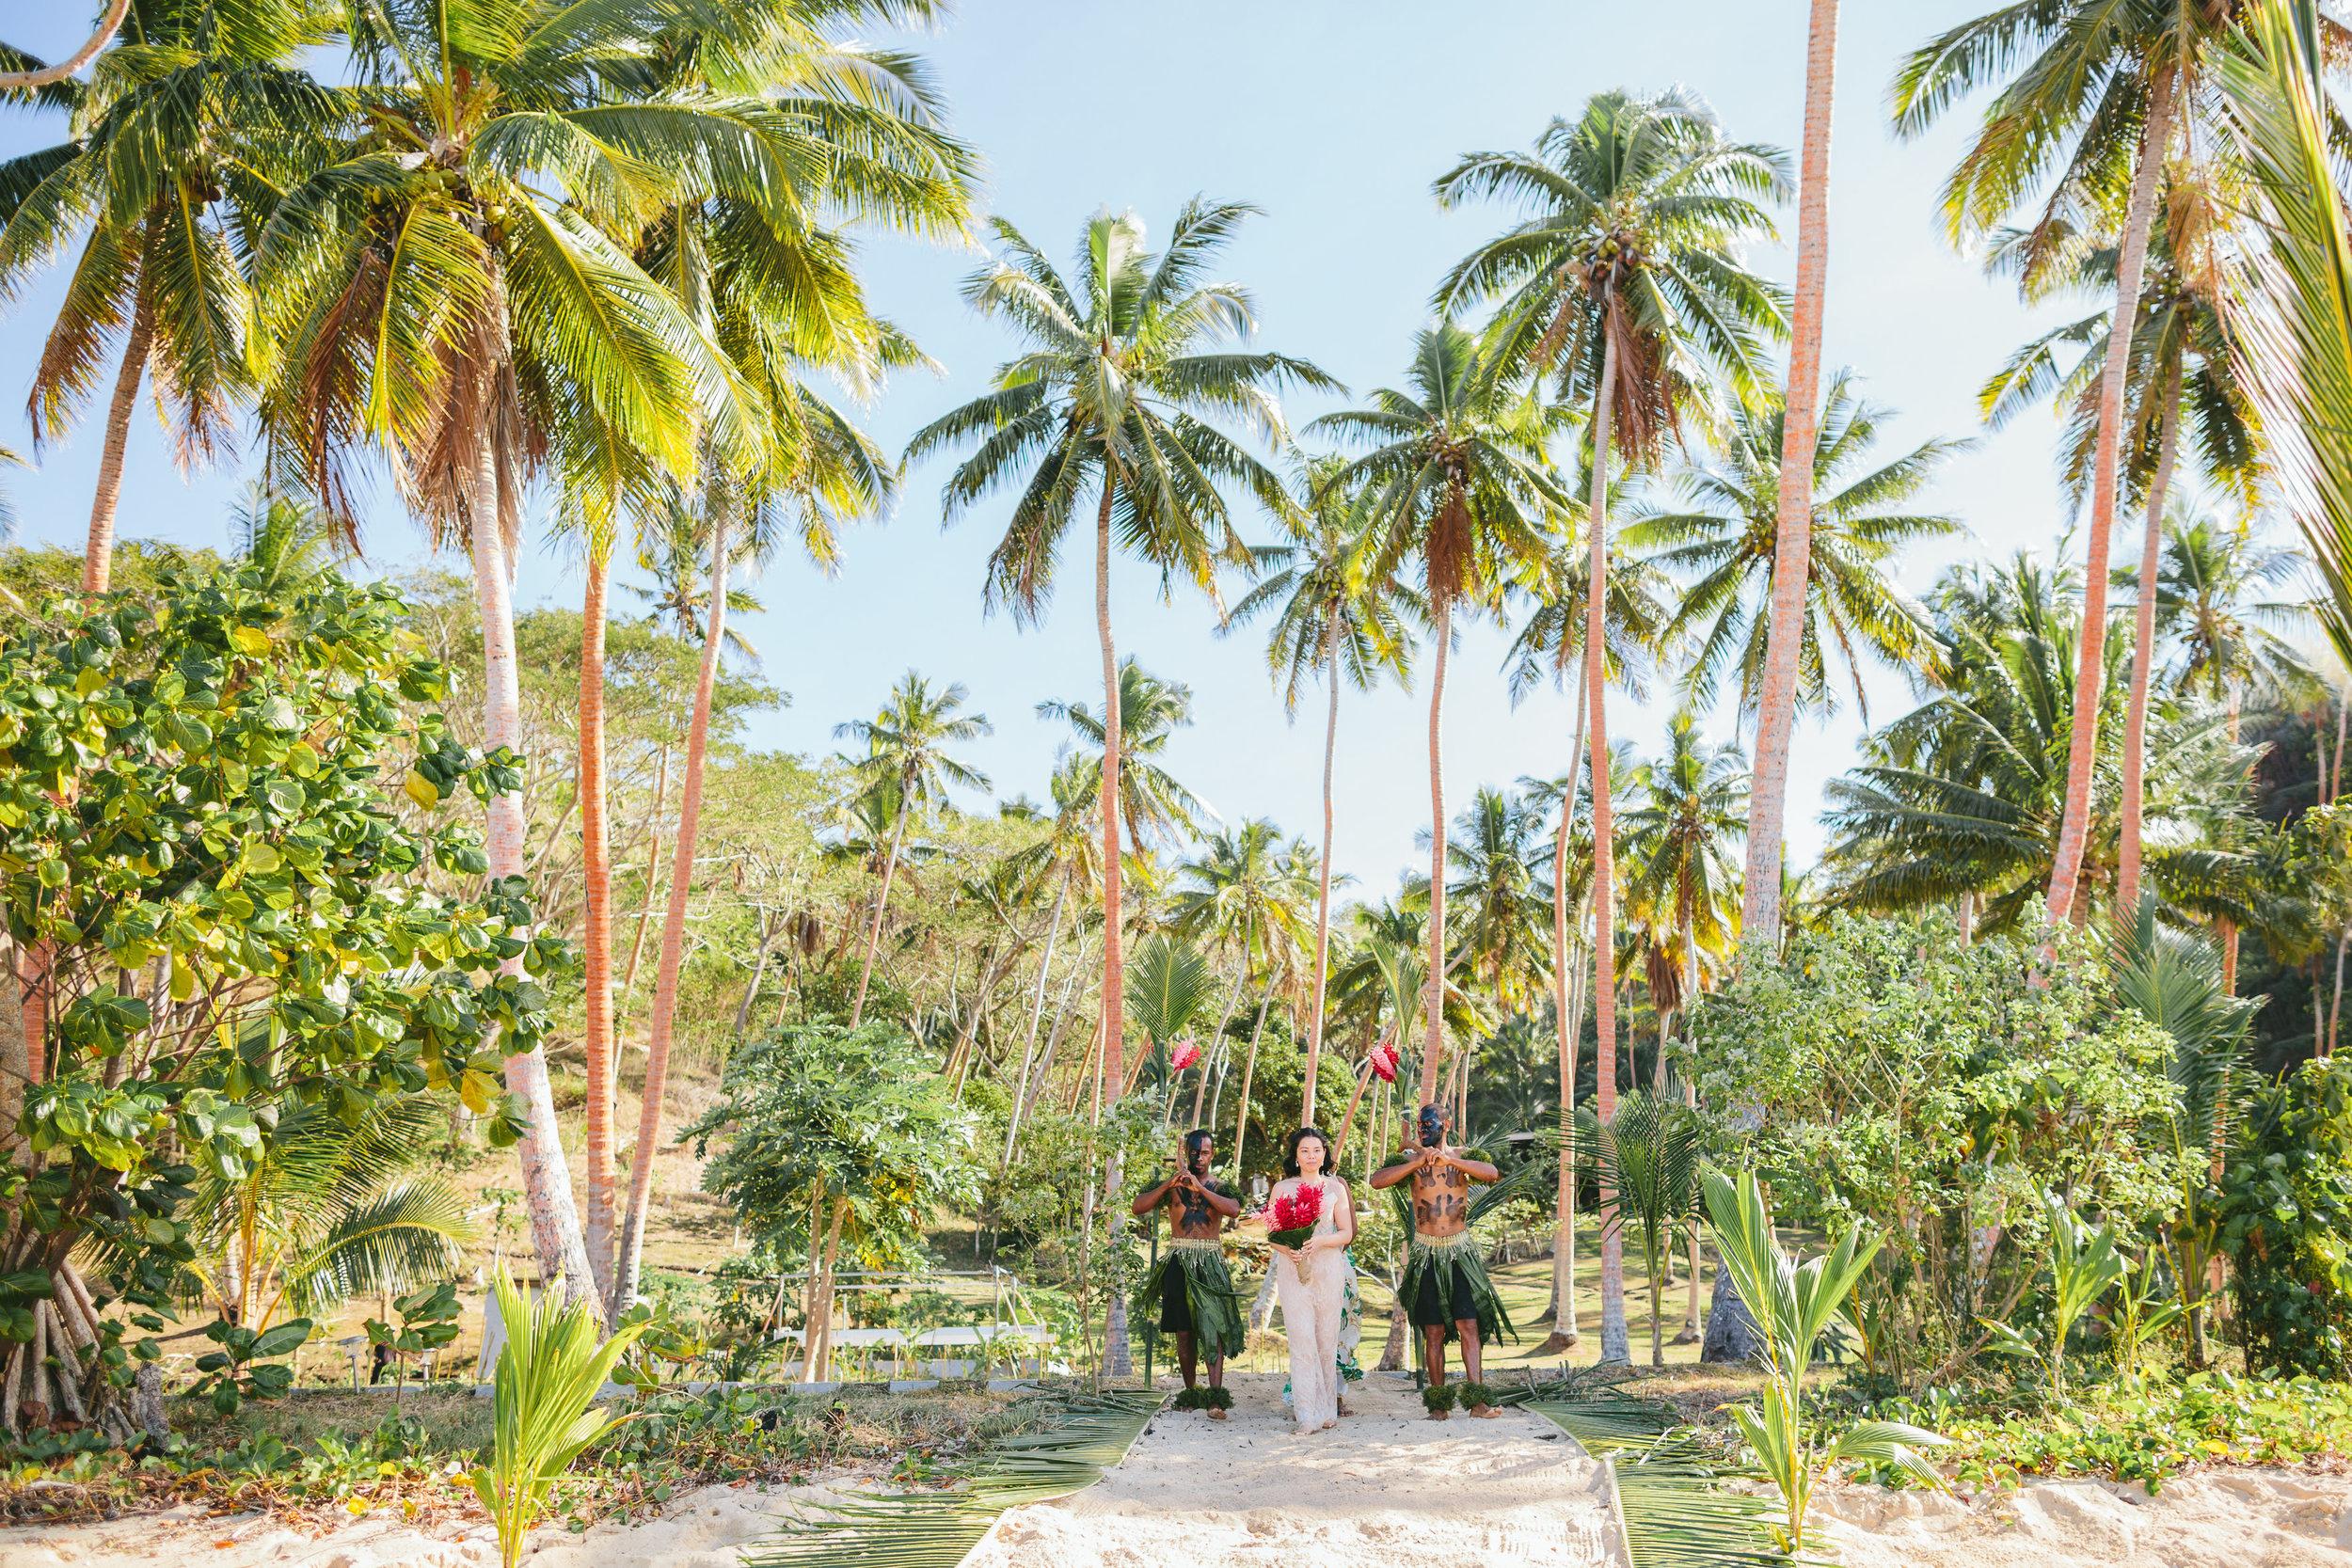 Fiji Warrior Escort- Fiji Wedding Elopement - The Remote Resort Fiji Islands